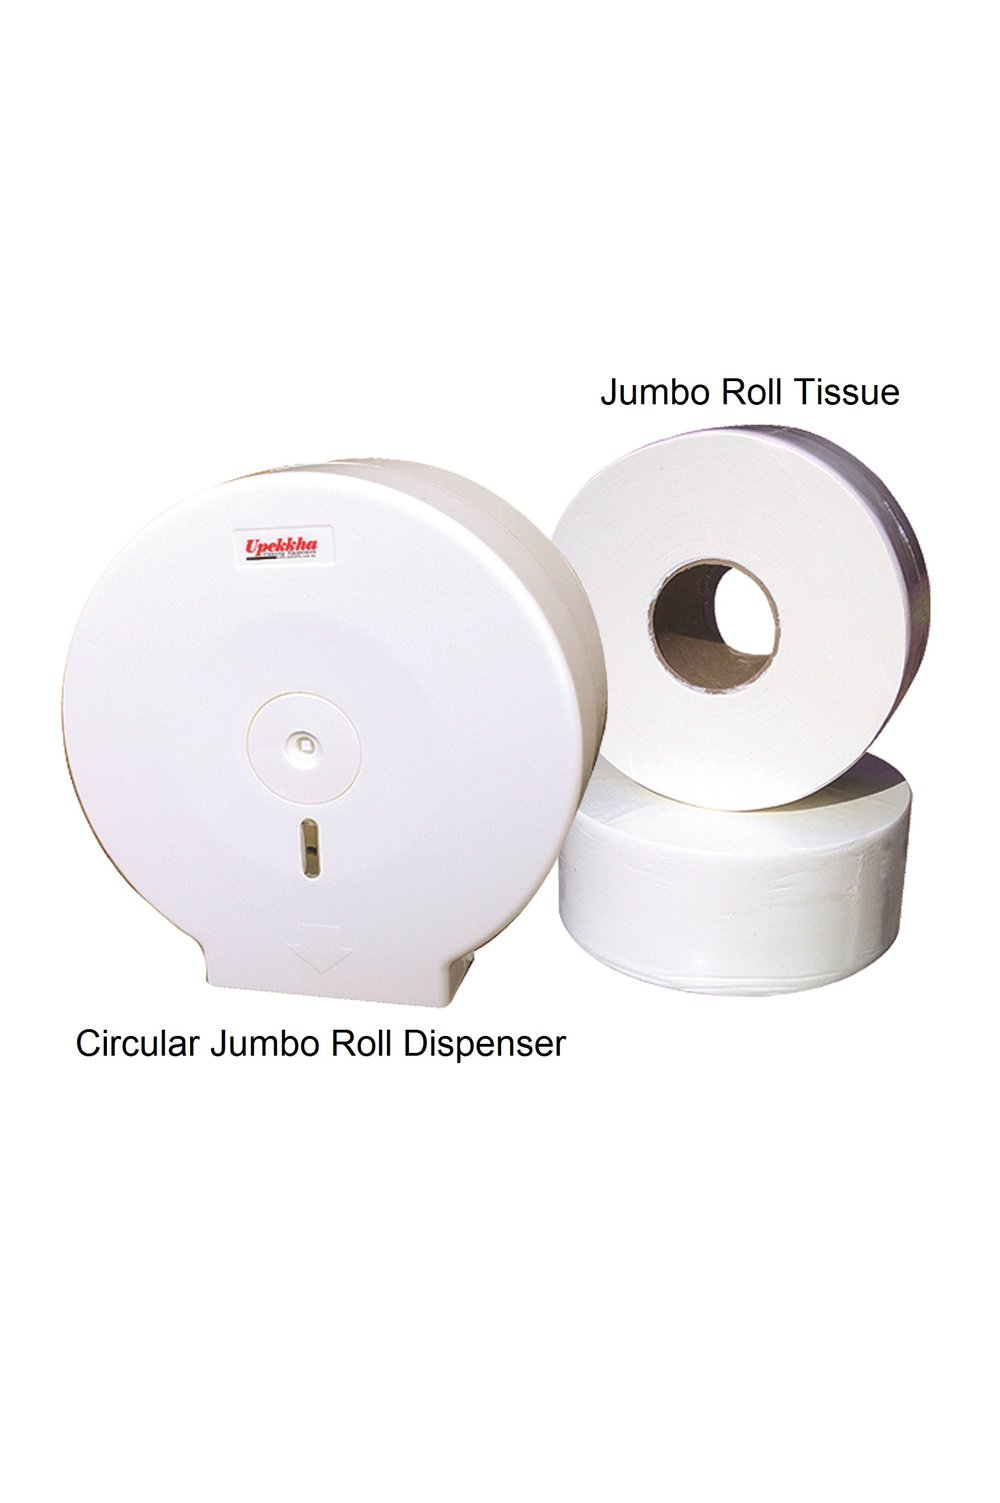 Circular Jumbo Roll Dispenser with Jumbo Roll Tissue